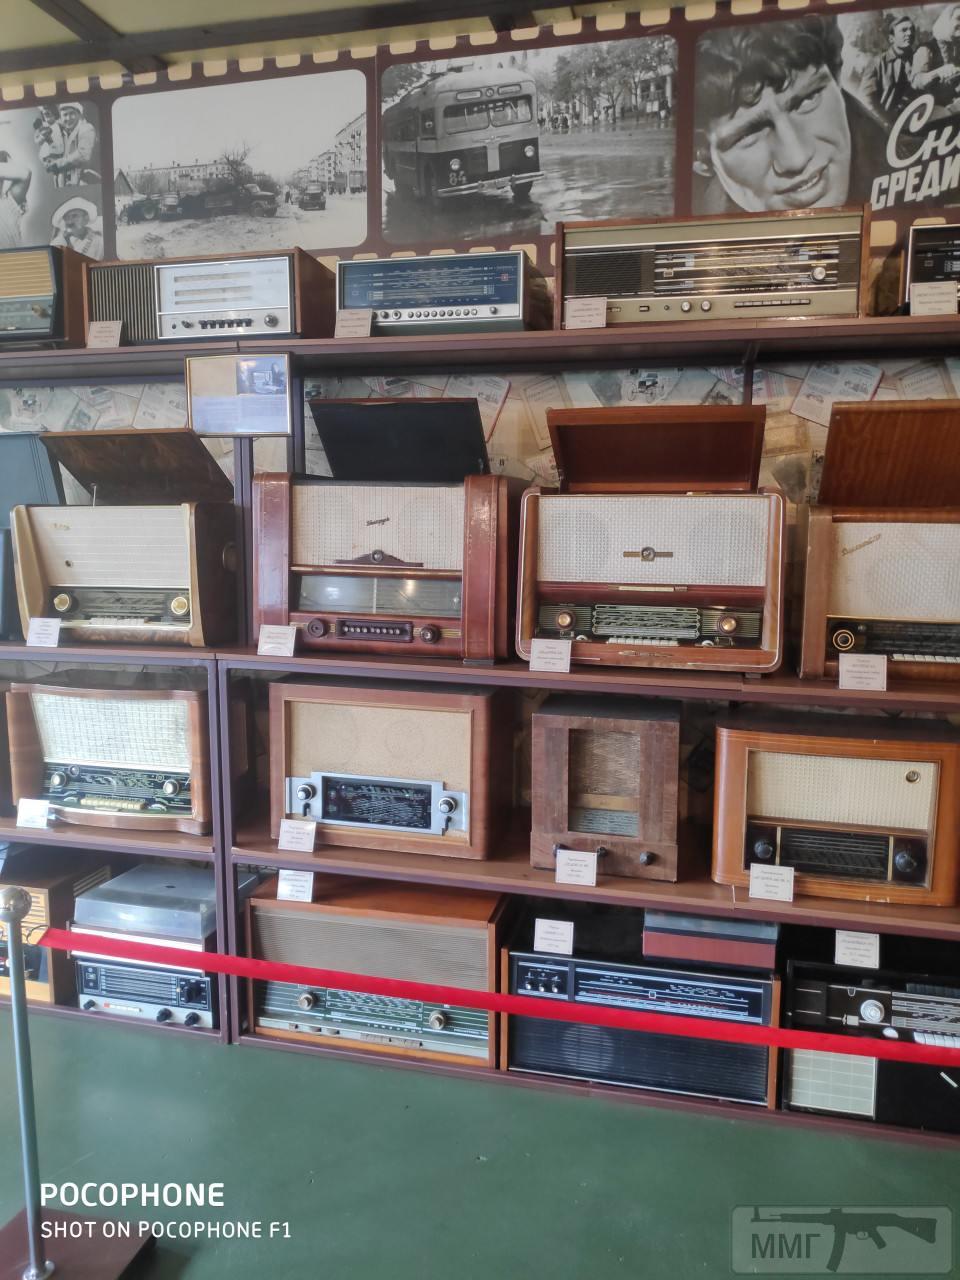 71126 - Музей техники Фаэтон в г. Запорожье